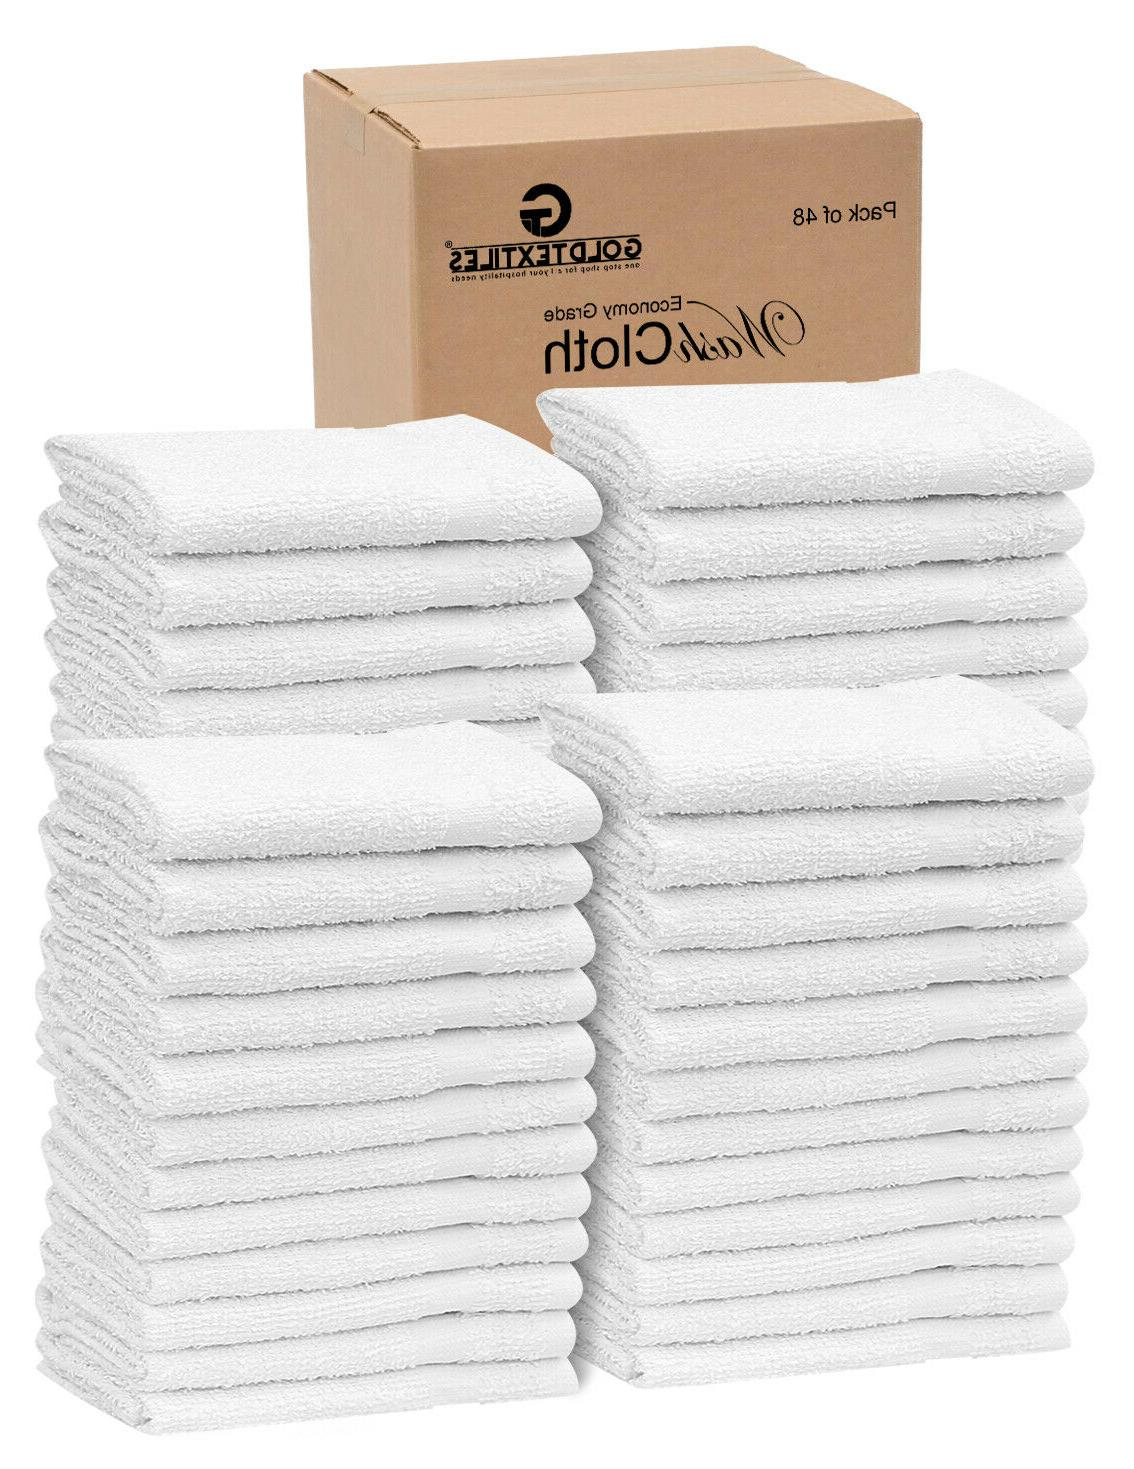 GOLD TEXTILES  Wash Cloth Kitchen Towels, Hand Towels 100% N